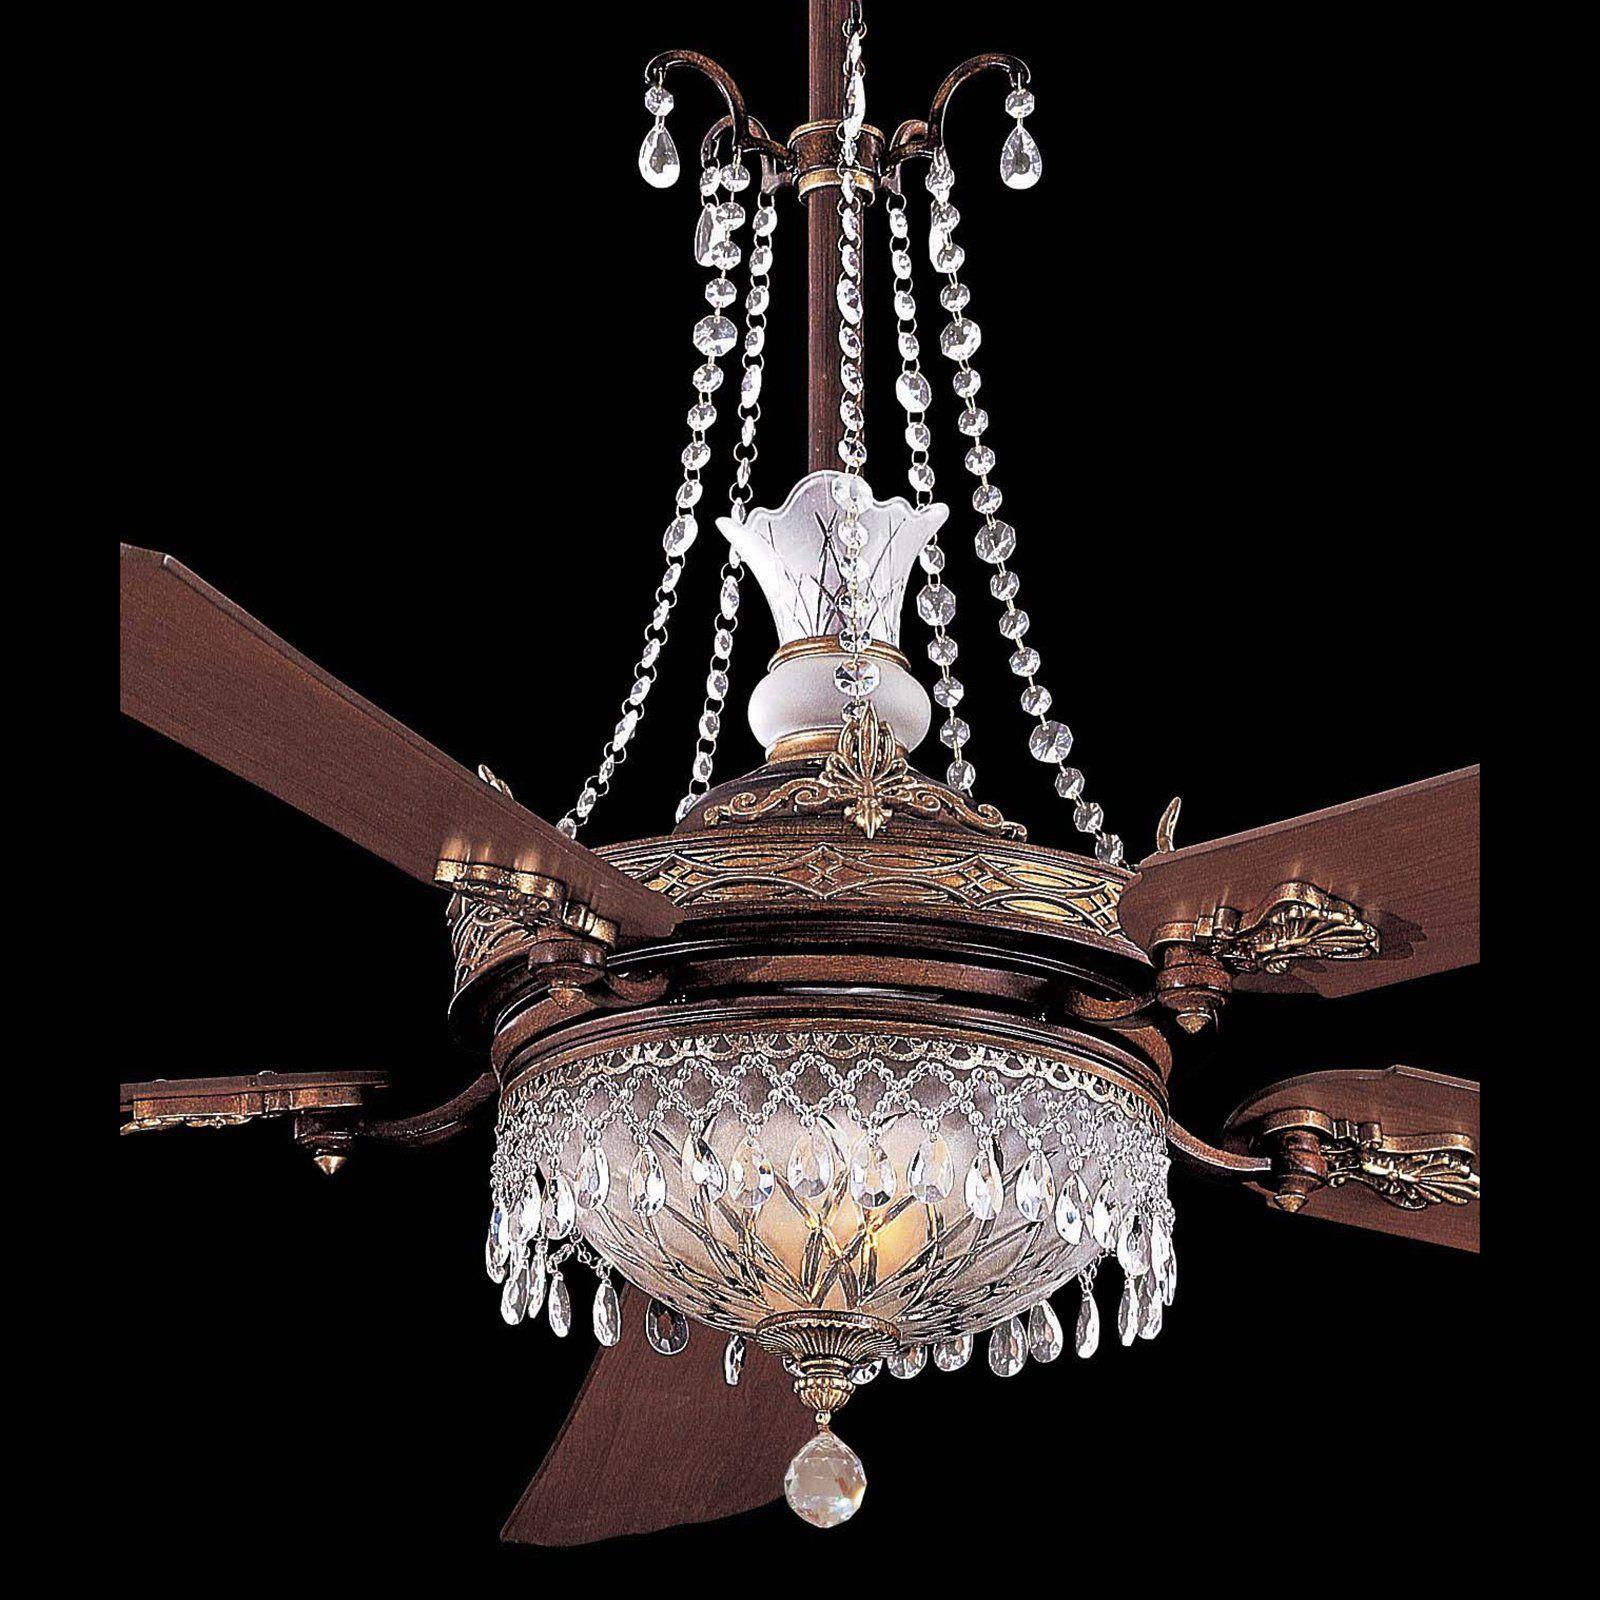 Minka Aire Ceiling Fan Crystal Kit SPECTRA Swarovski Crystals Ceiling Fans